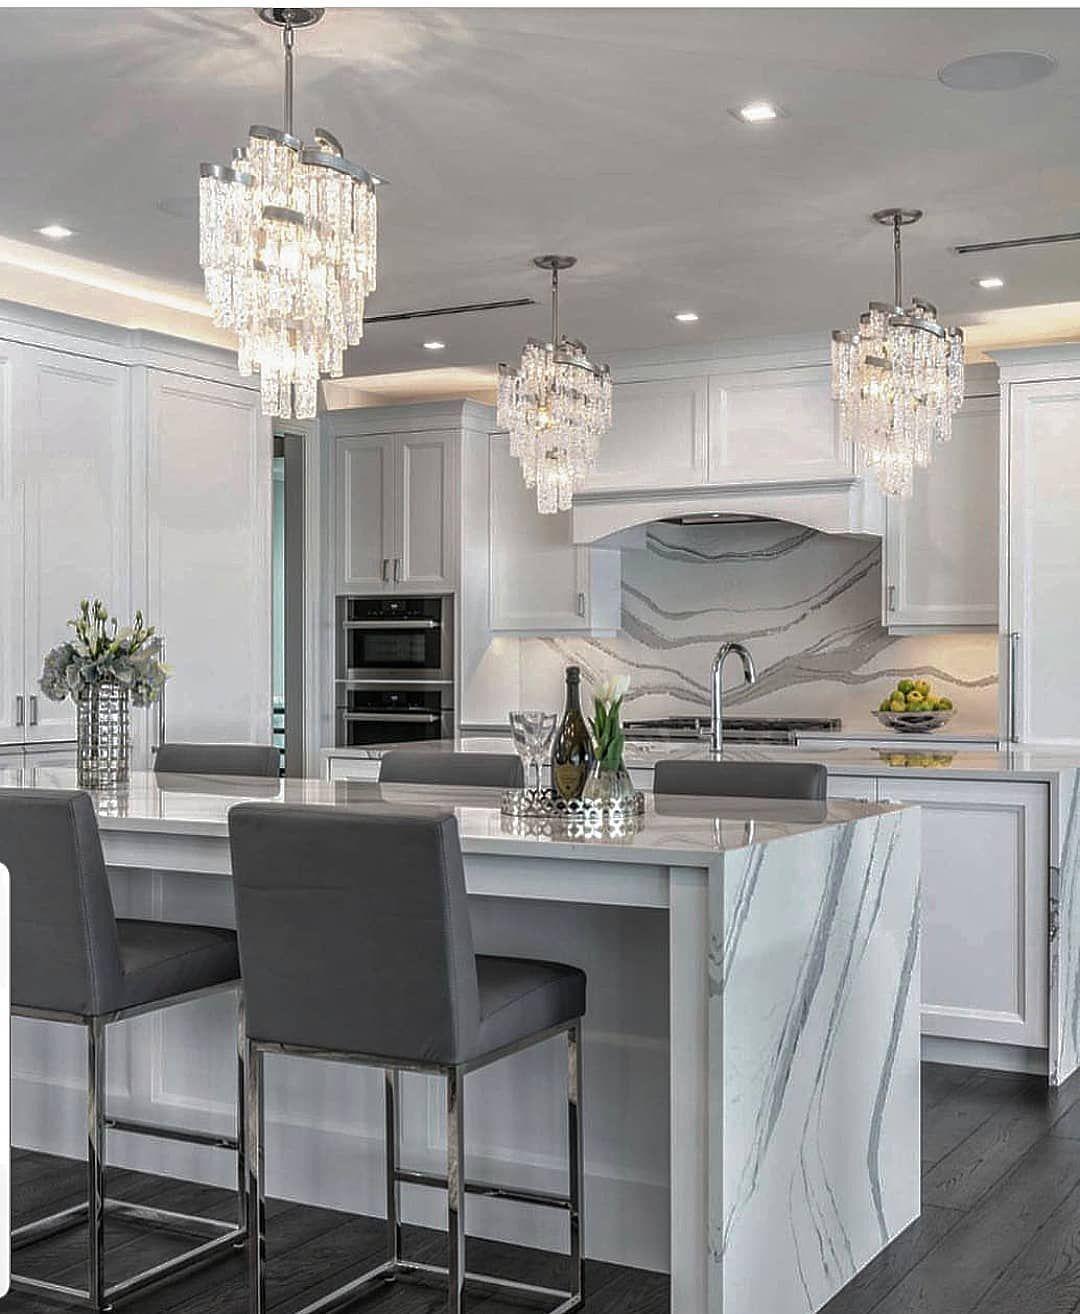 "Simple Kitchens Open Kitchen Design Ideas Small Designs: Home Decor/Interior Design On Instagram: ""Raise Your Hand"